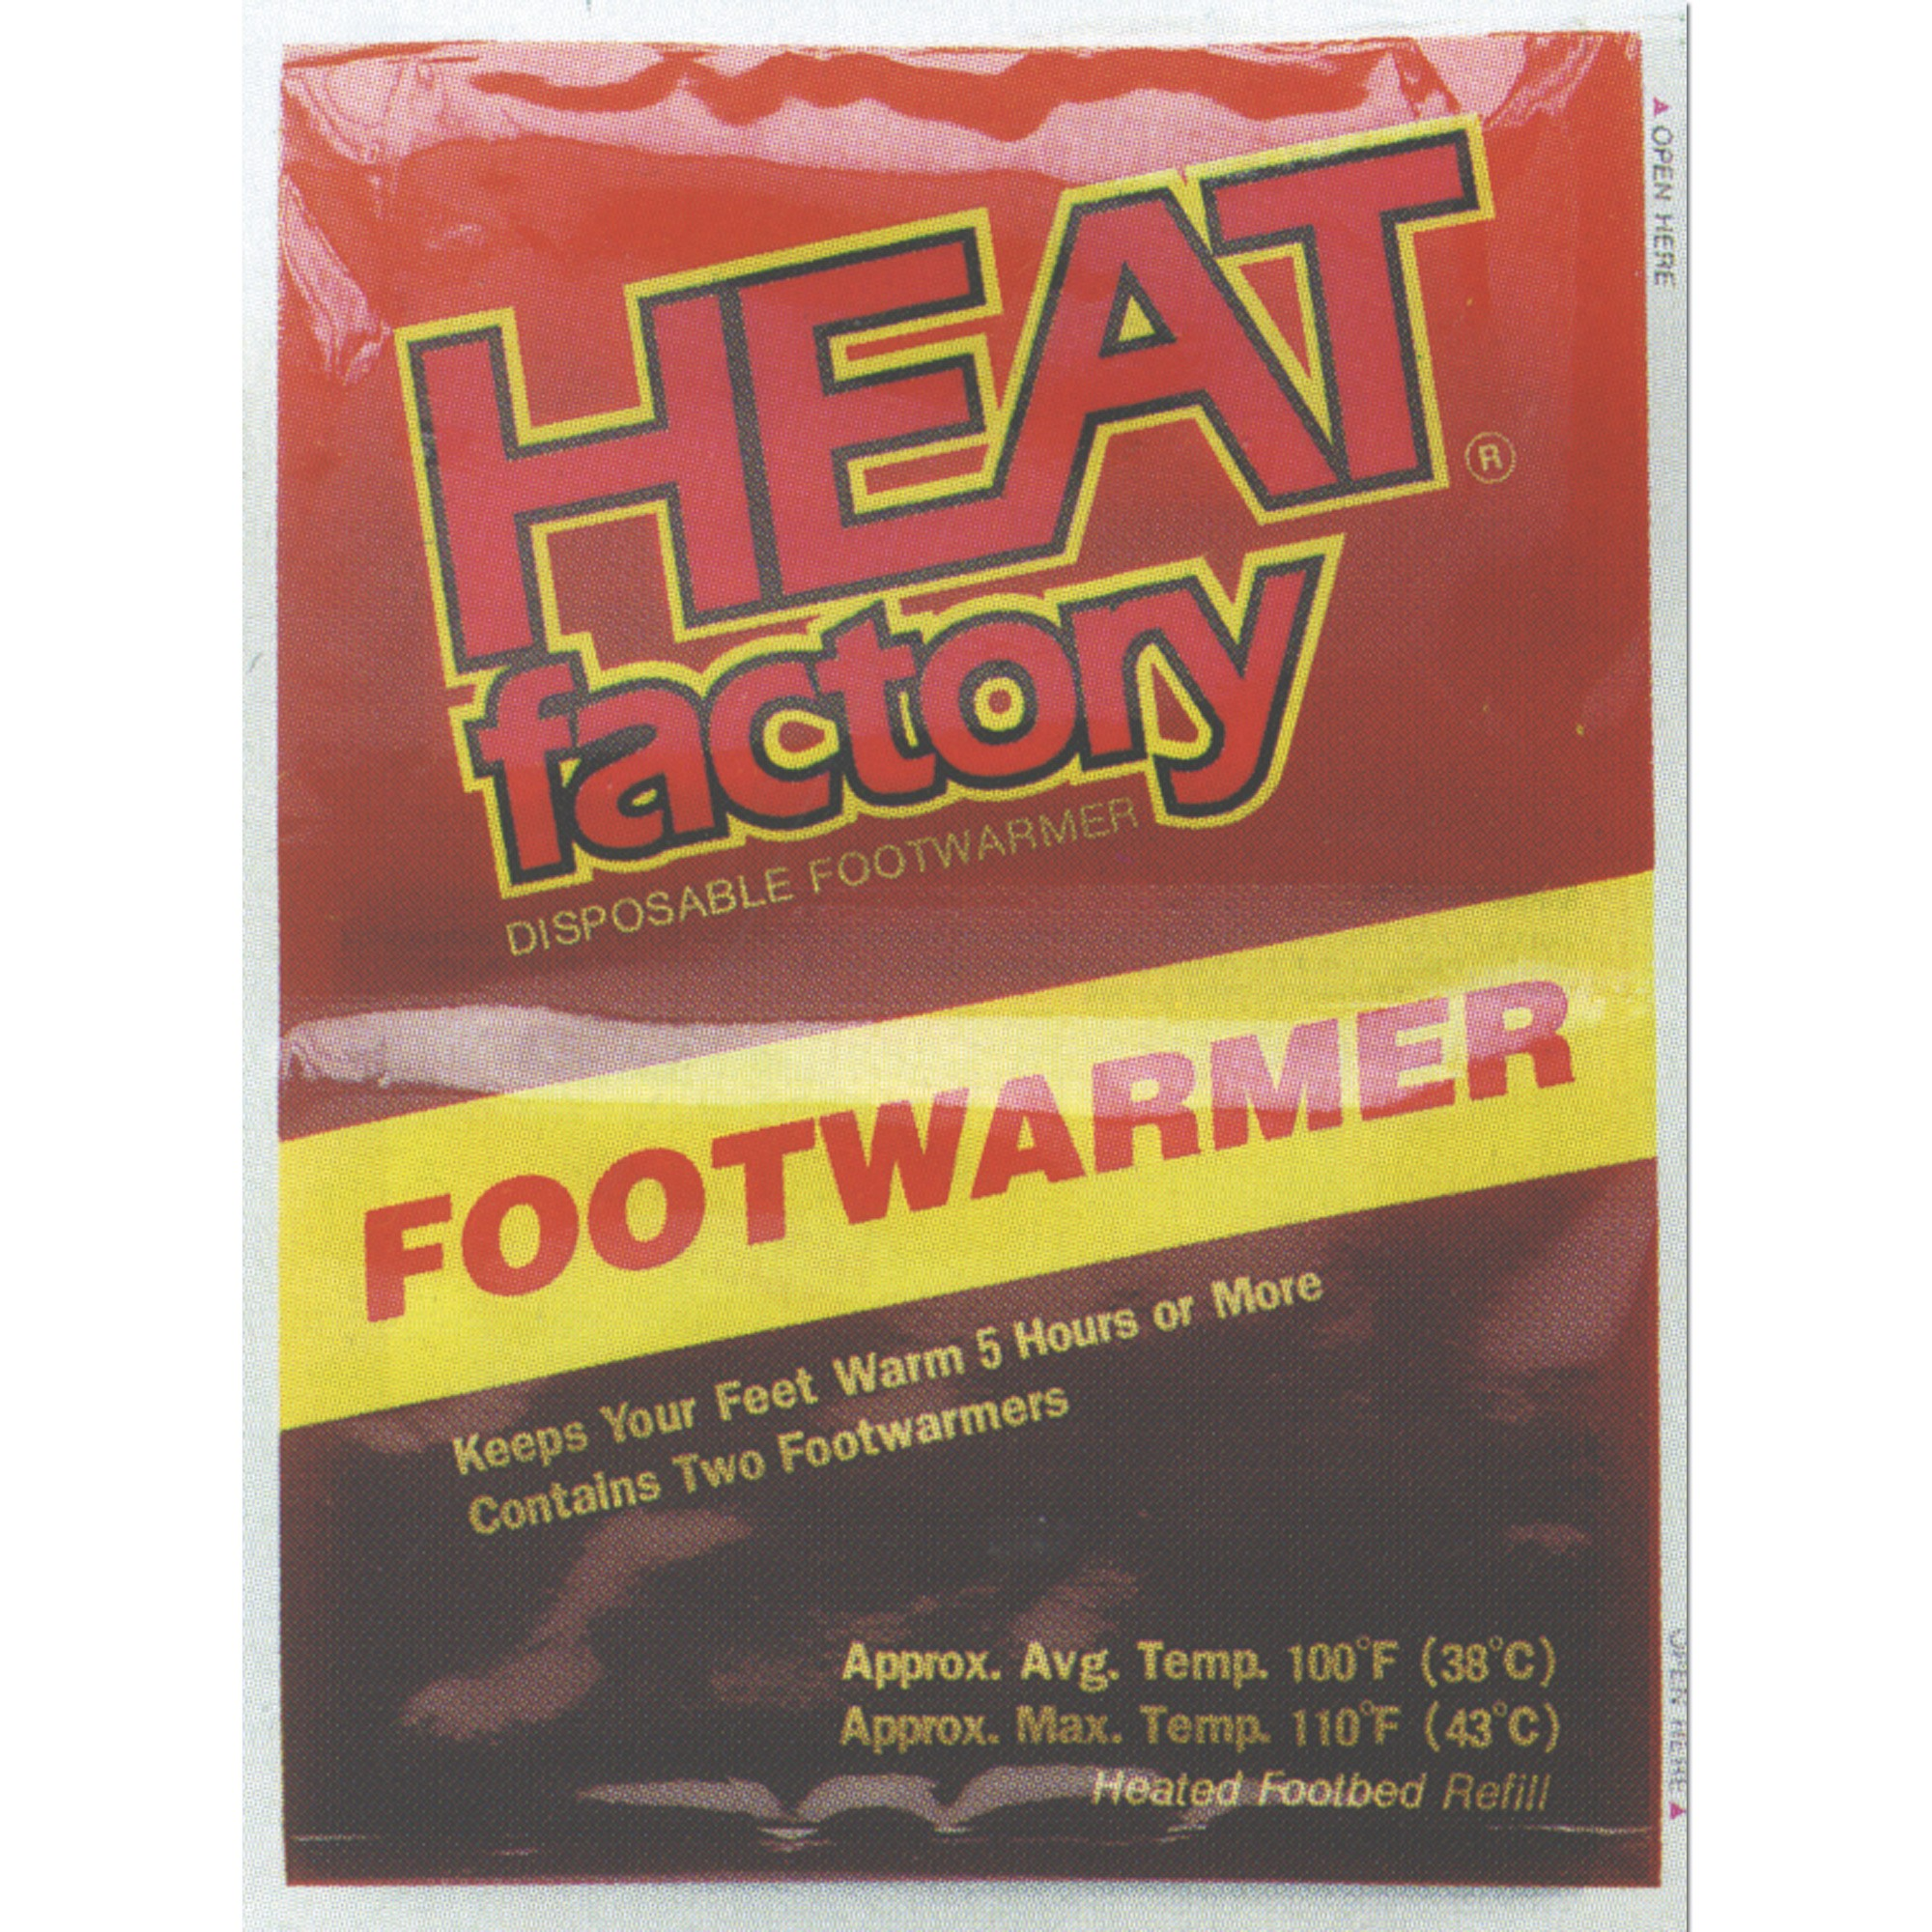 Footwarmer Replacement